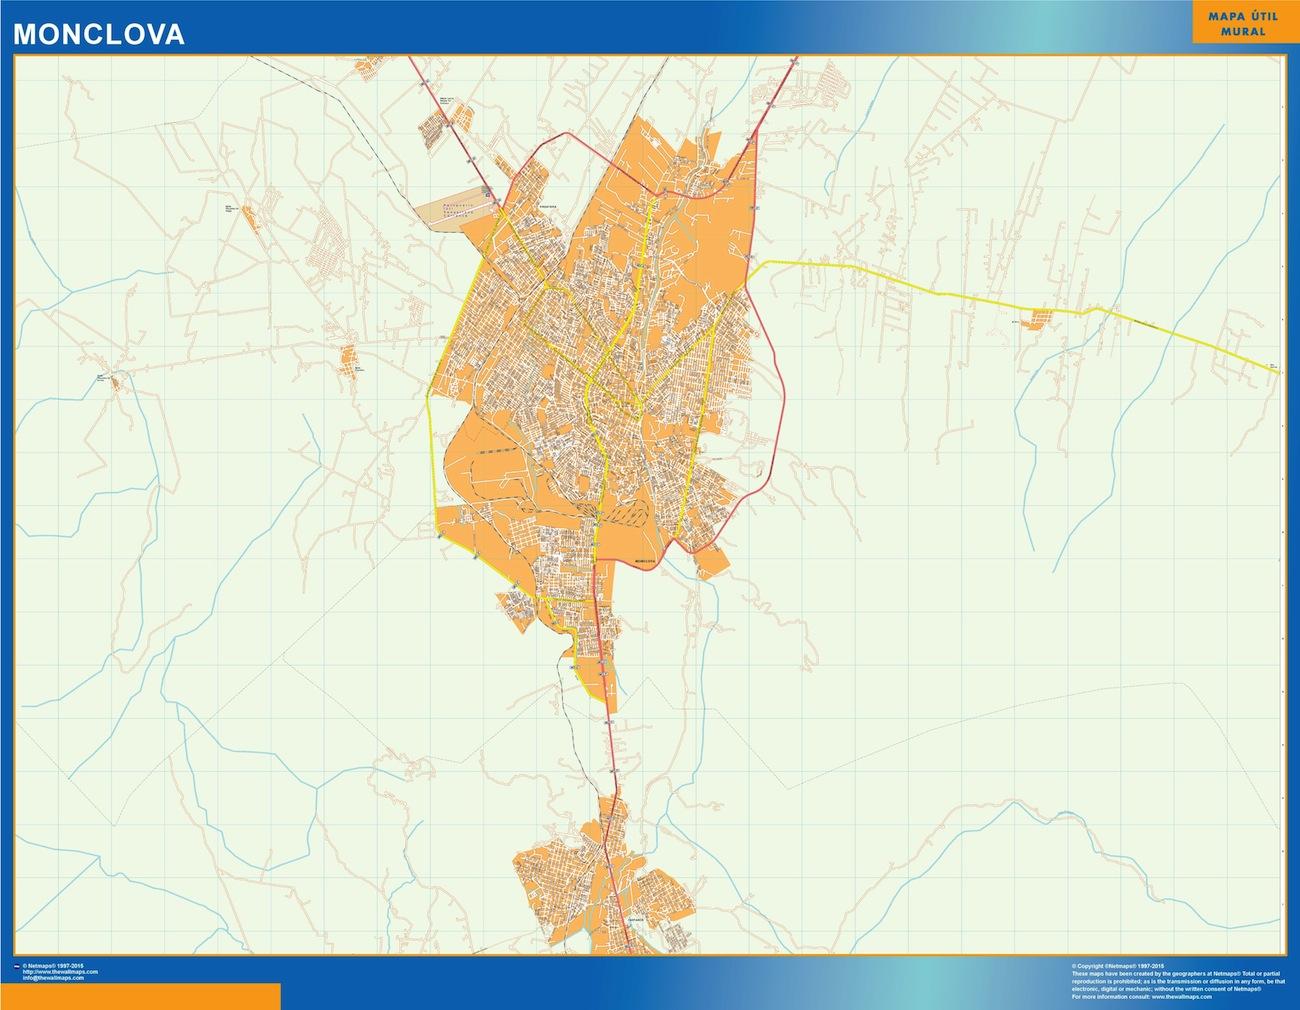 Mapa Monclova en Mexico plastificado gigante